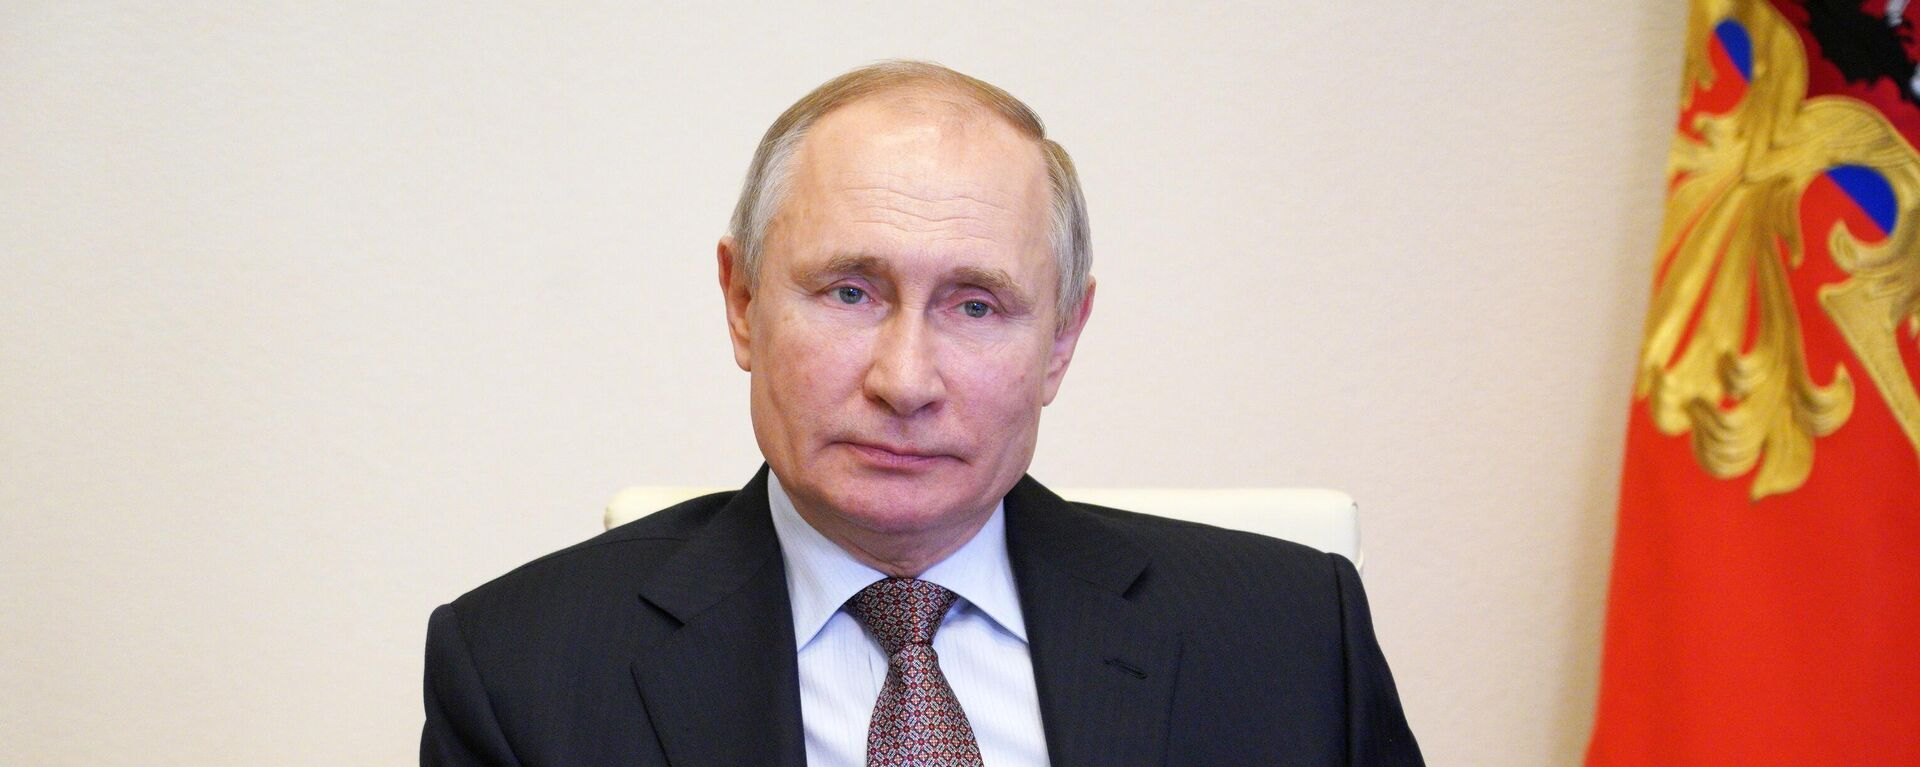 Vladímir Putin, presidente de Rusia - Sputnik Mundo, 1920, 04.06.2021